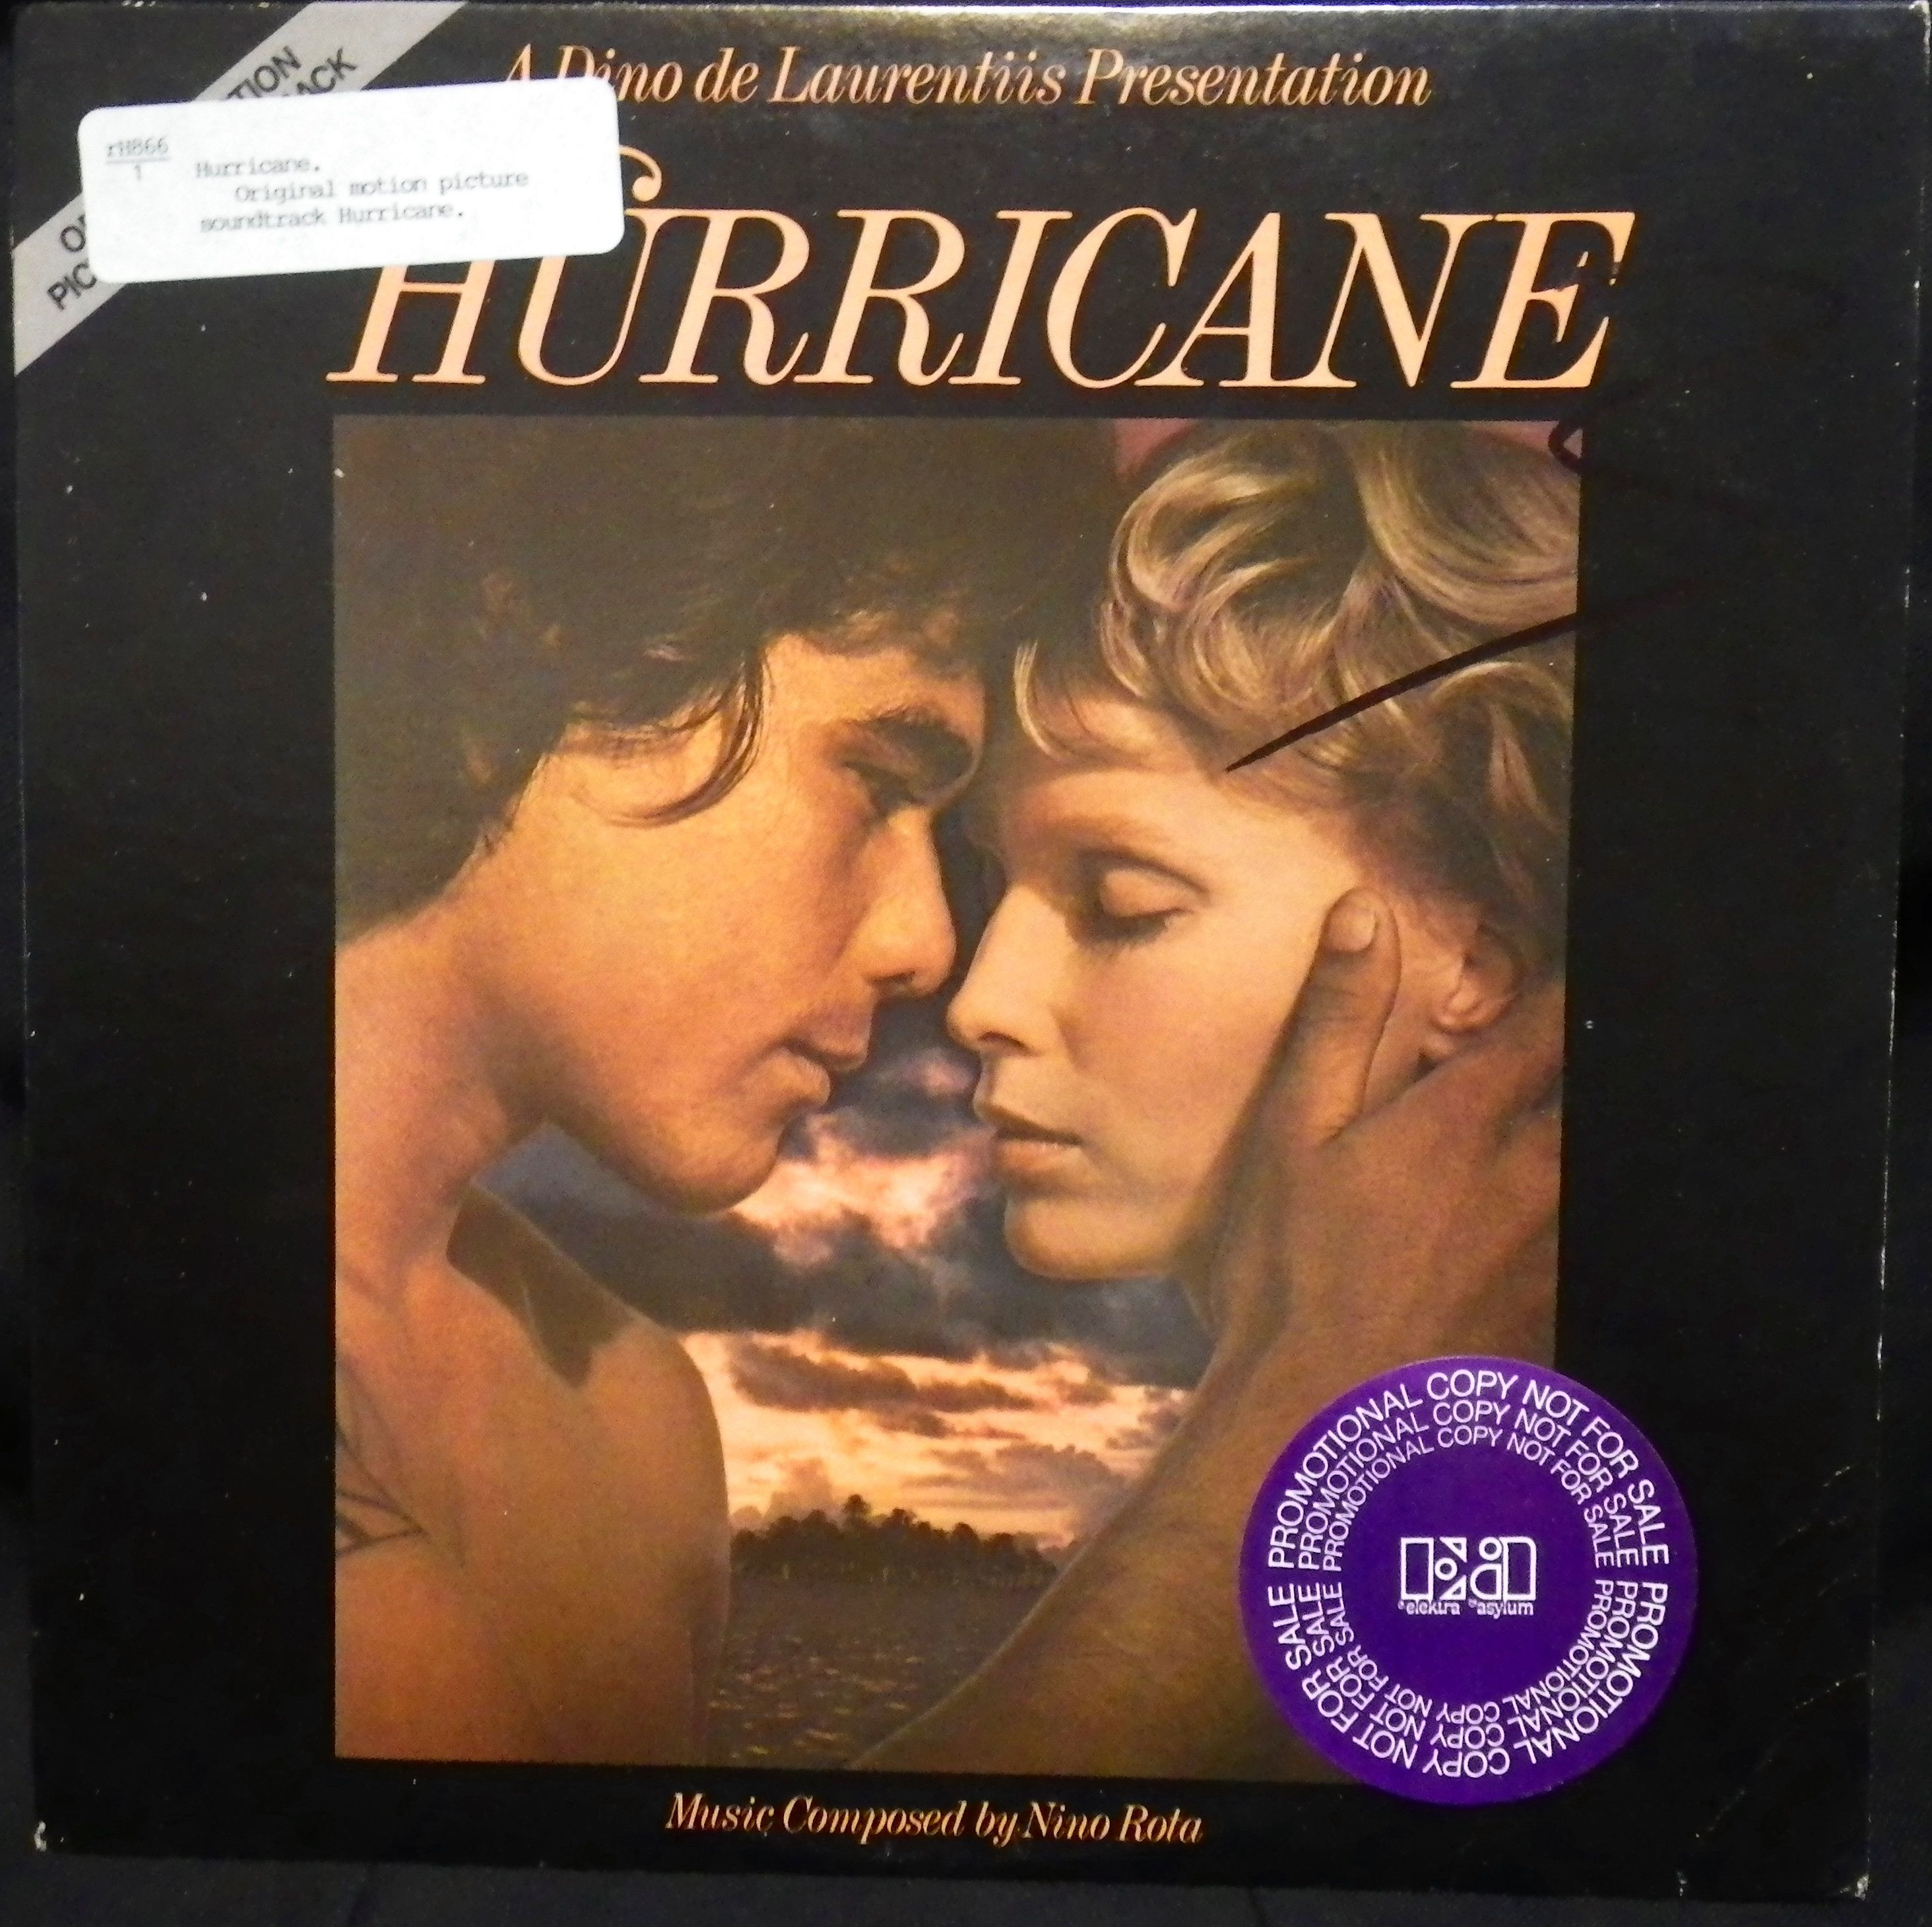 Exotica/South Pacific record. Nino Rota (composer). Hurricane original motion picture soundtrack. -Los Angeles, Calif., Elektra Records 5E-504, stereo, p1979.